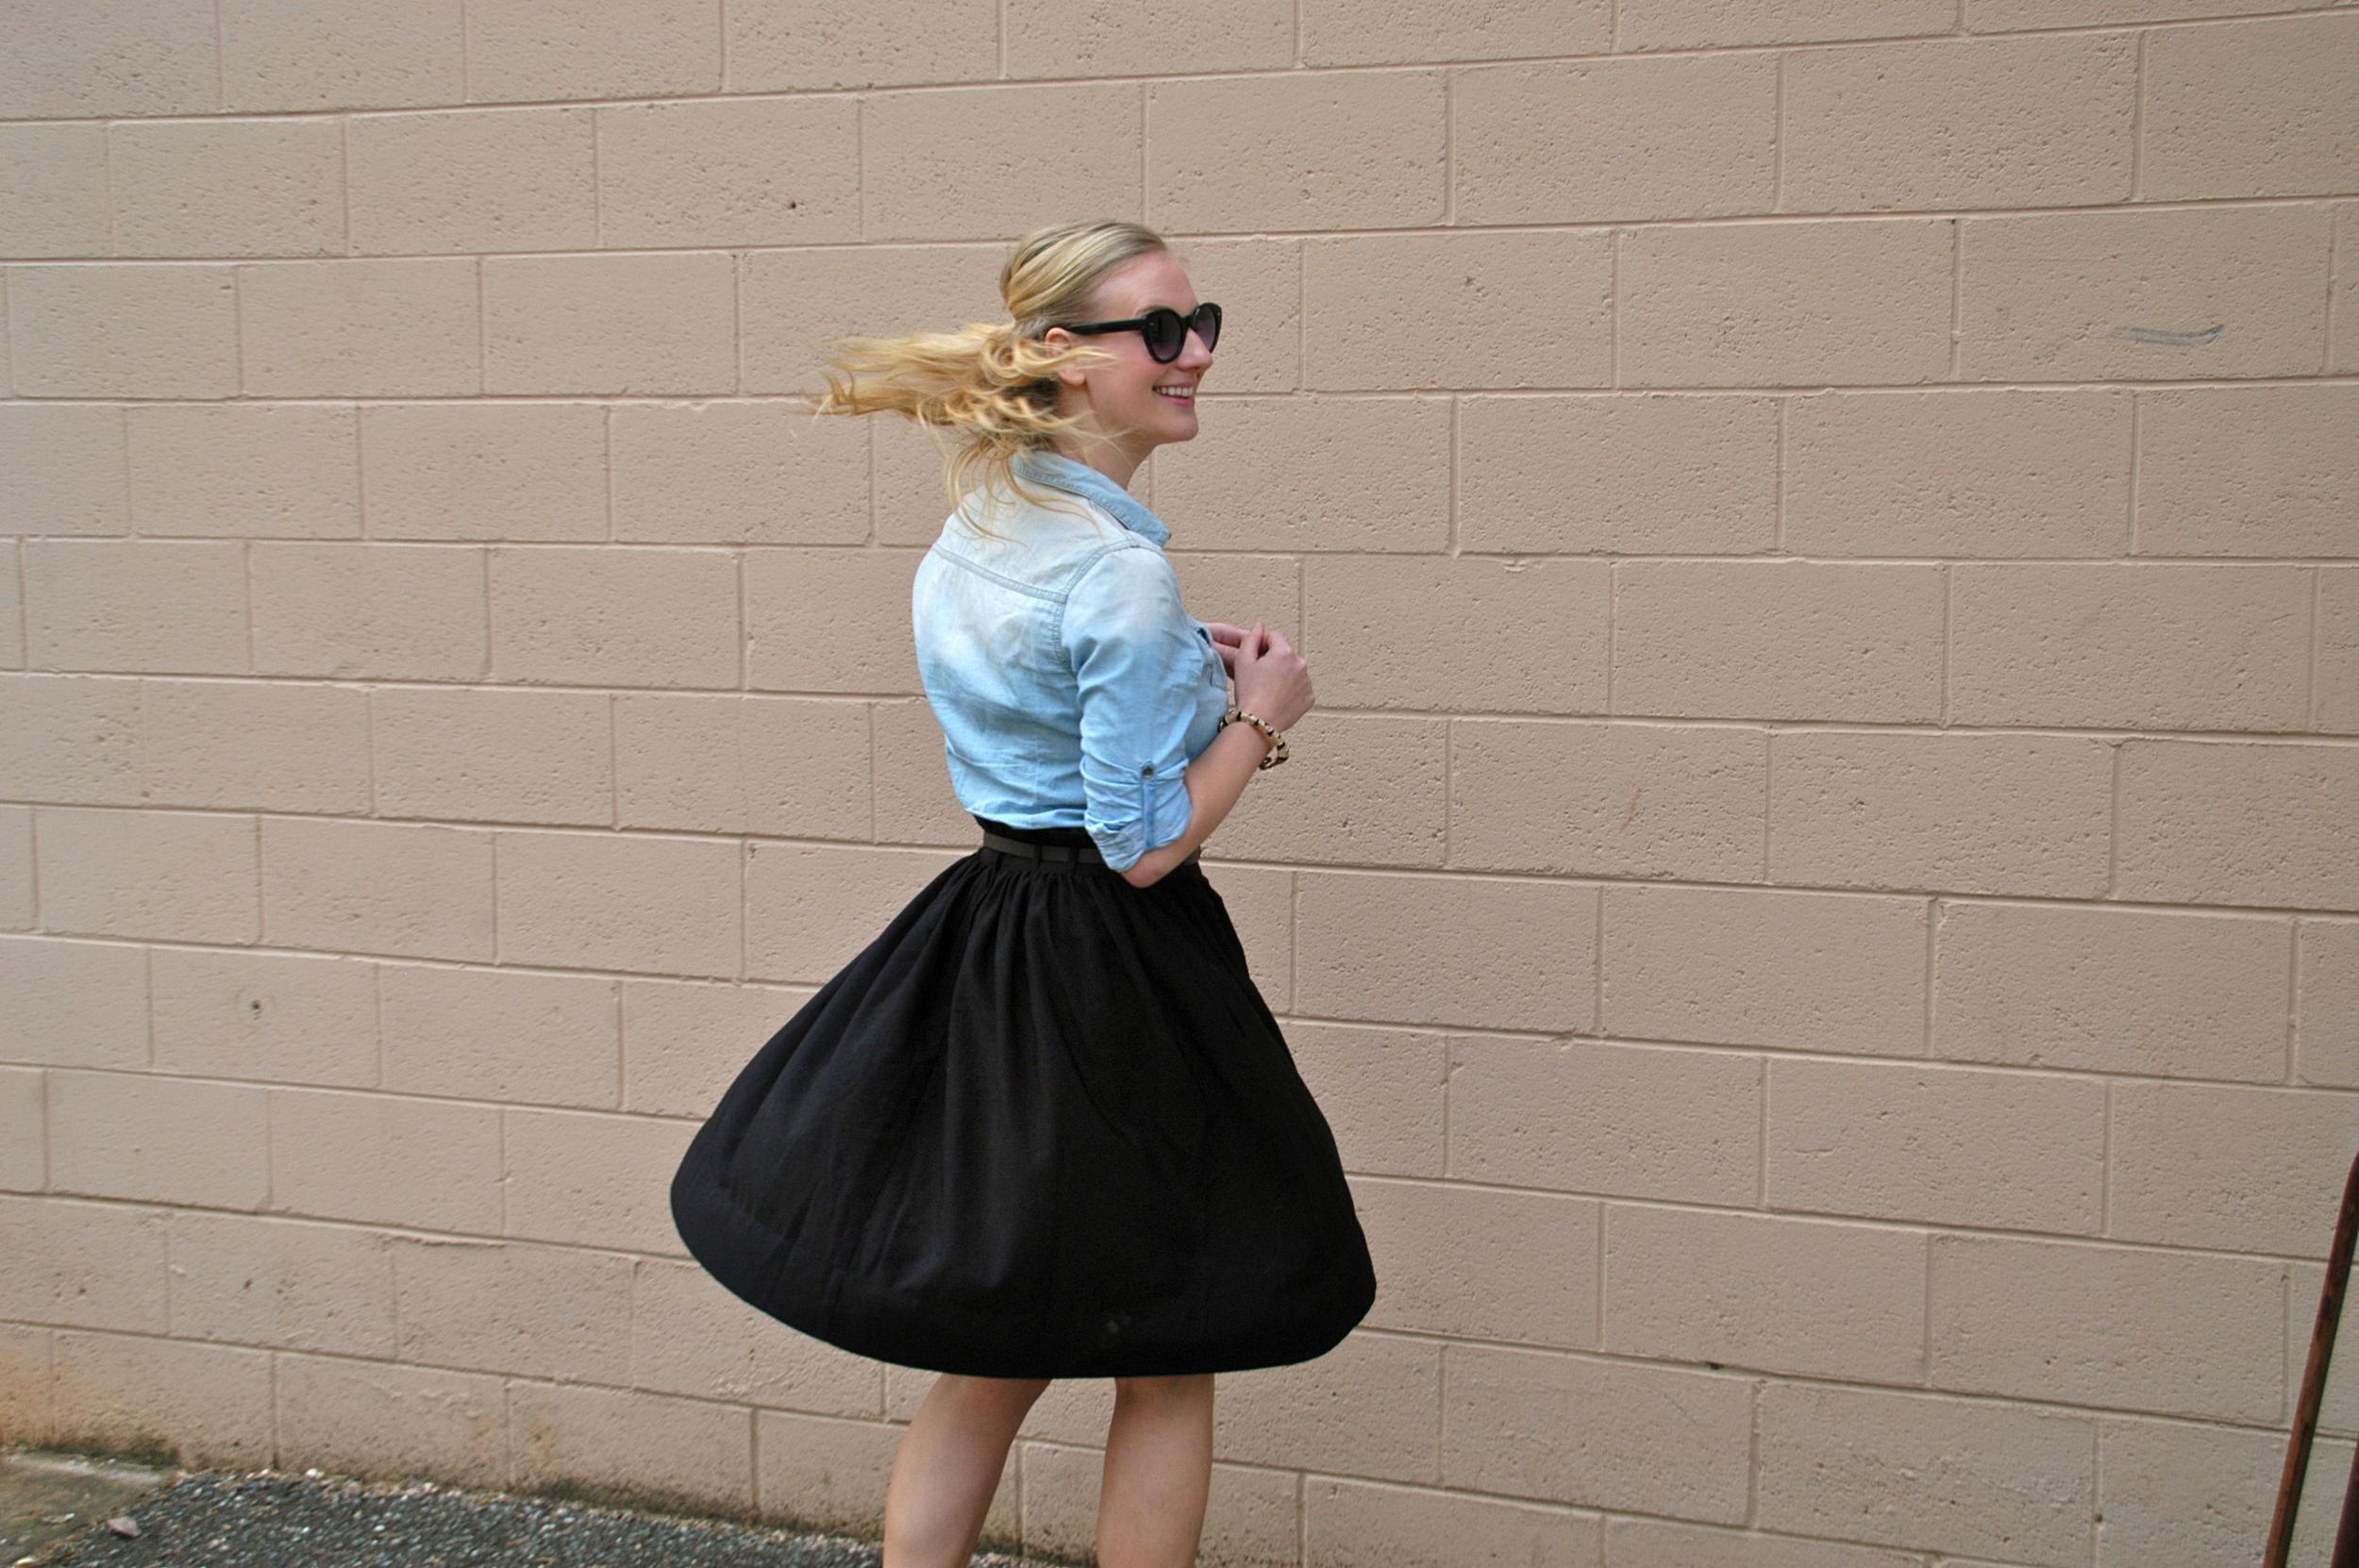 Skirt: H&M   Button-up: Target   Shoes: H&M   Purse: ShoeDazzle   Glasses: Target   Jewelry: Vintage, H&M, Target